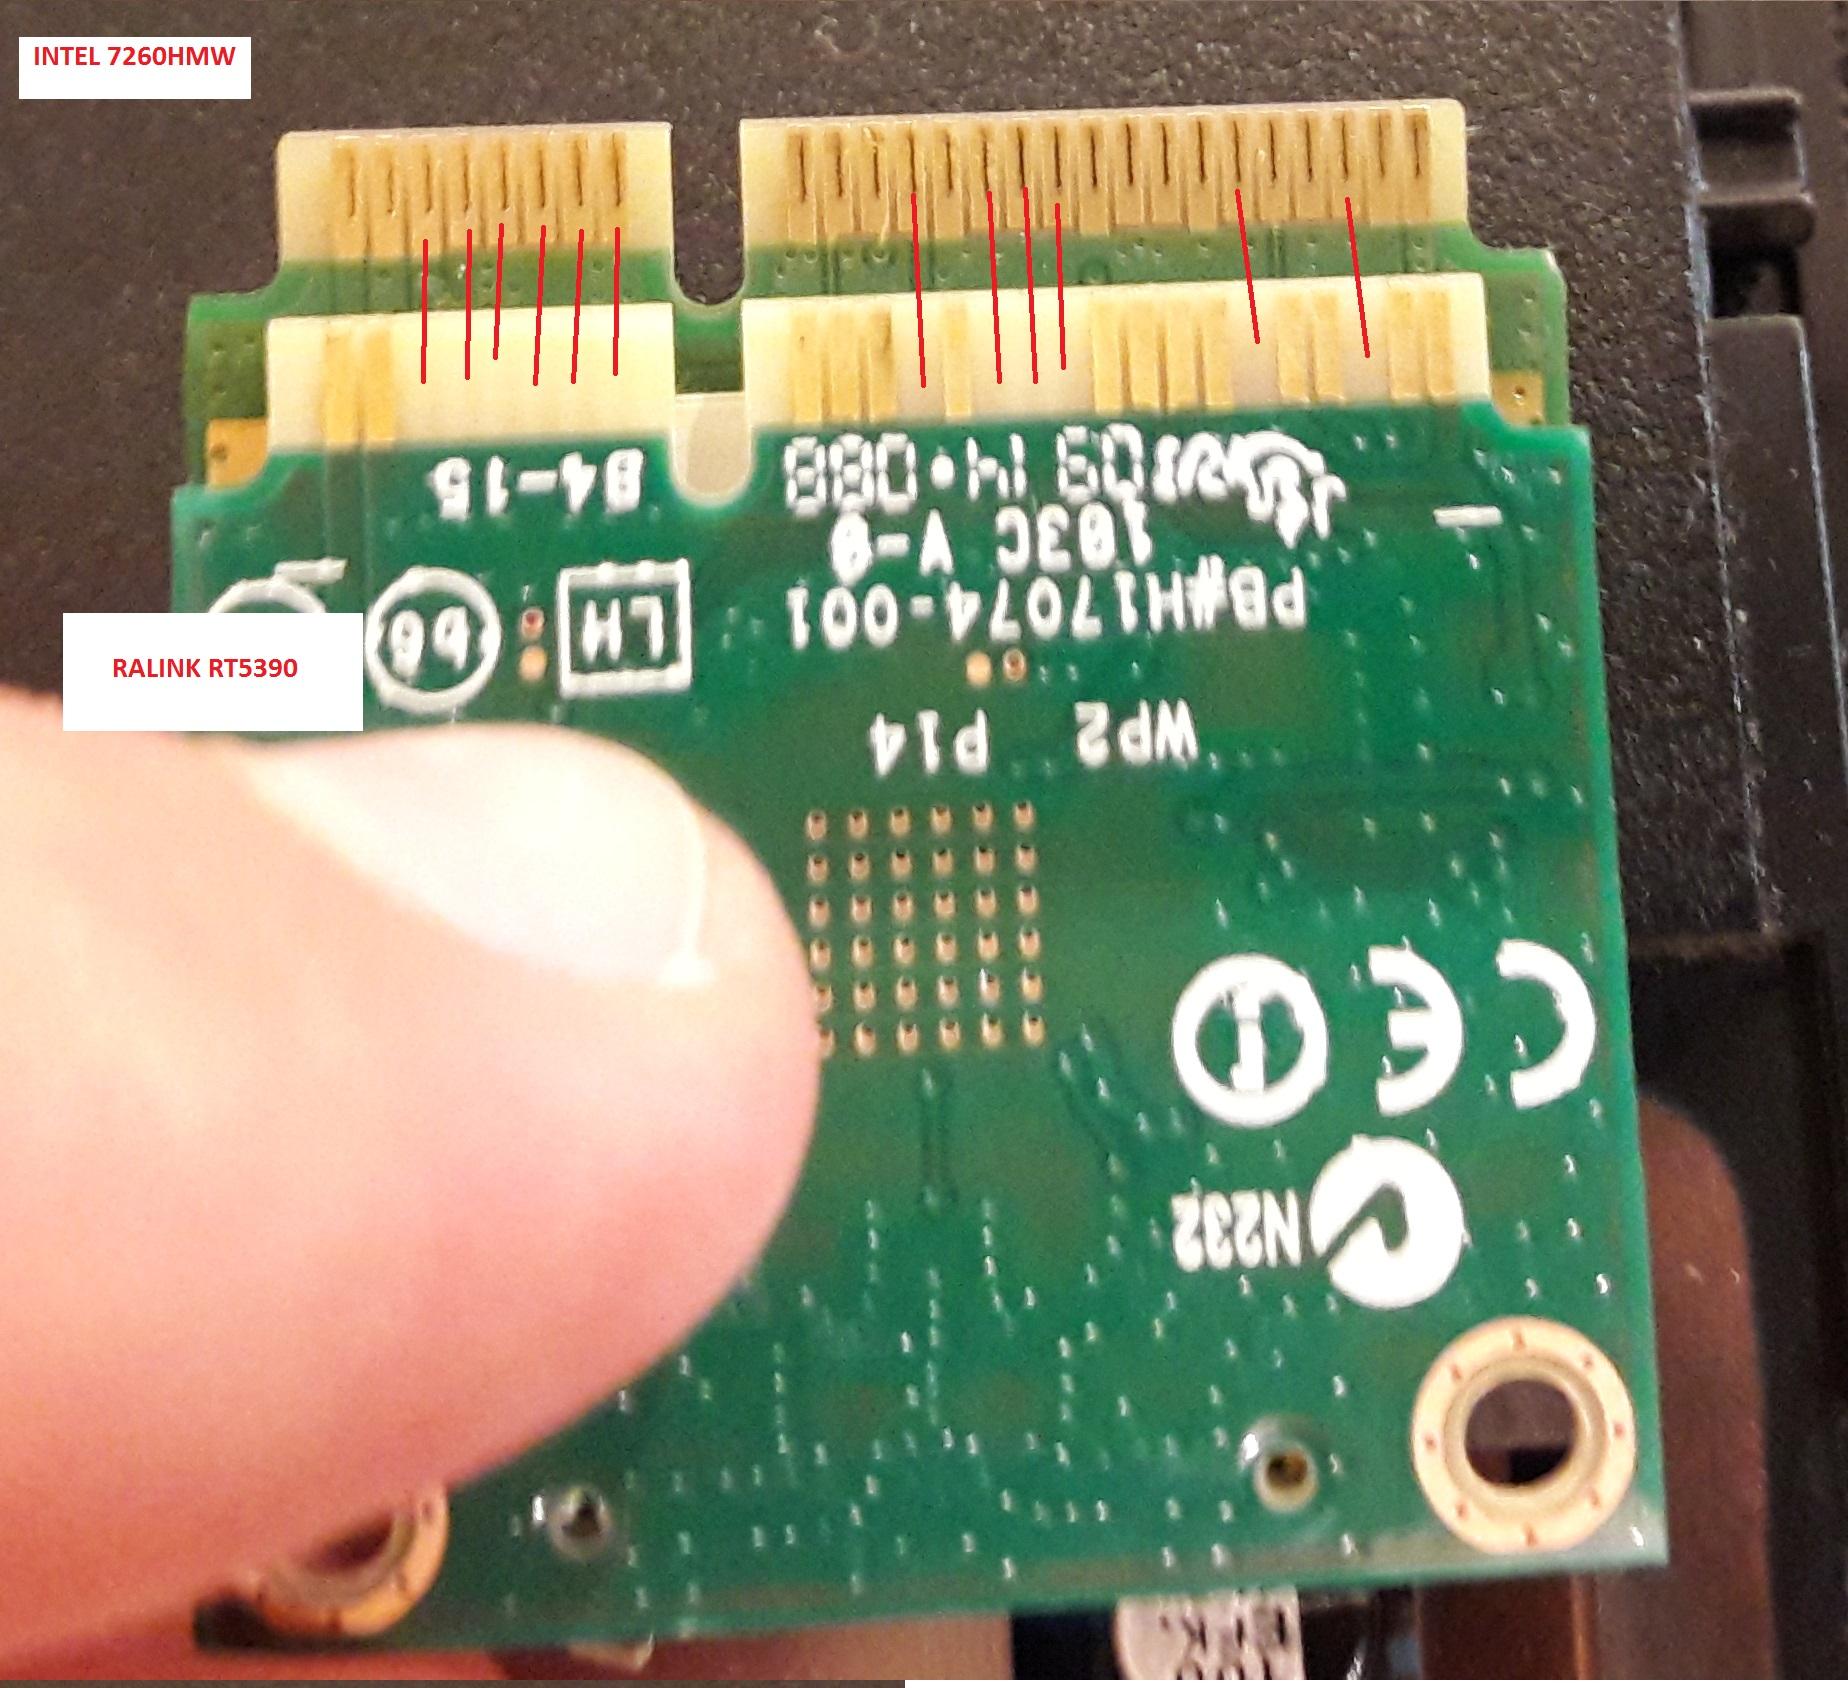 Foxconn CPWL801P Ralink WLAN Windows 8 Driver Download